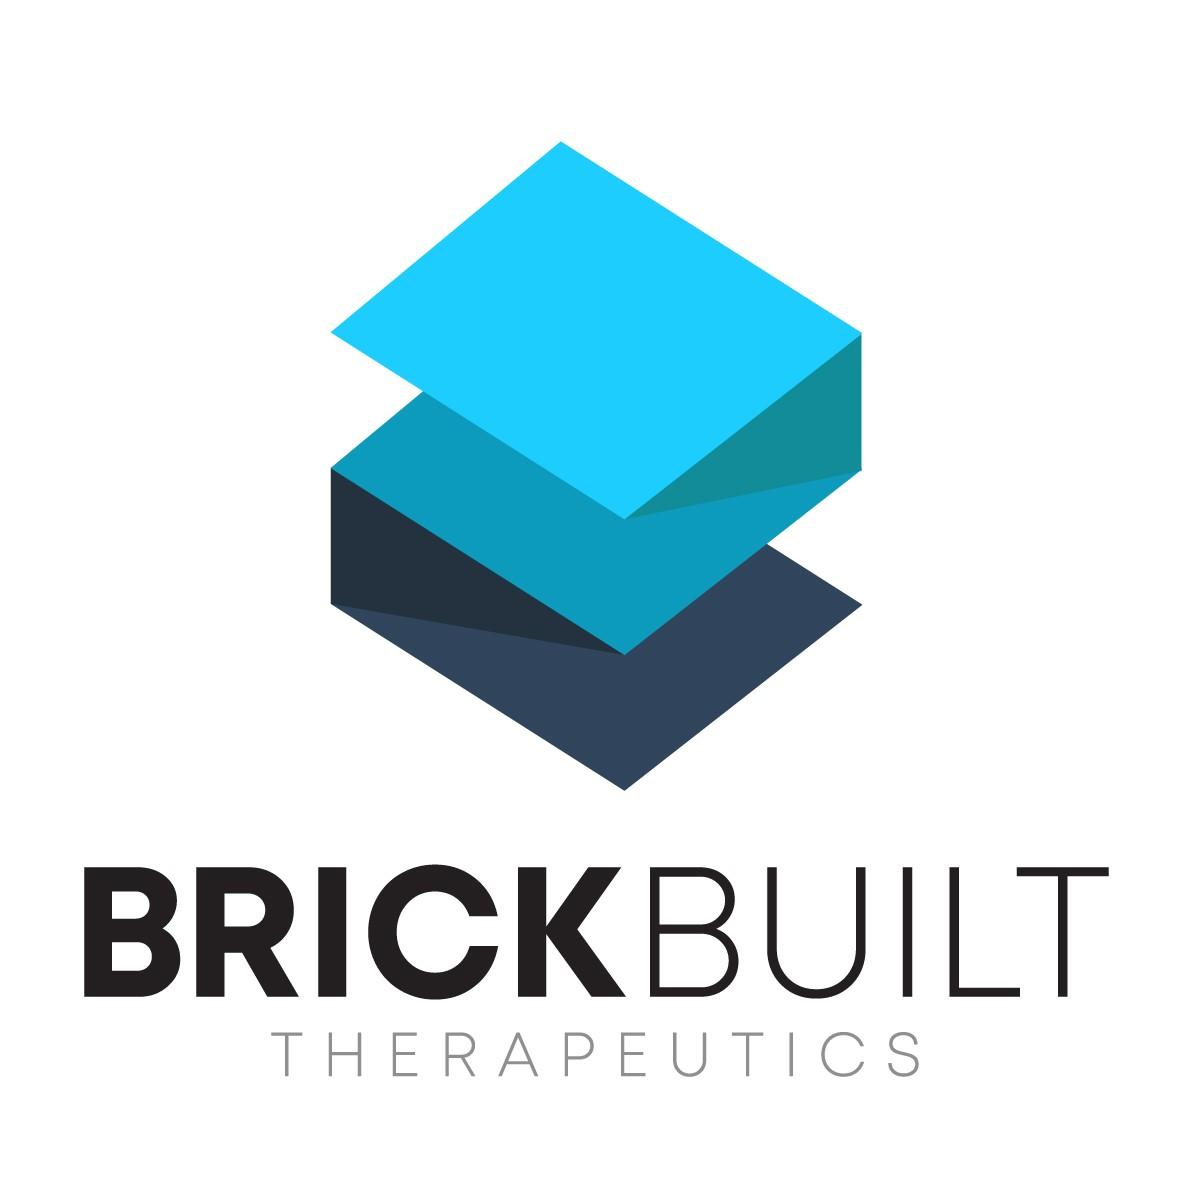 Brick Built Therapeutics